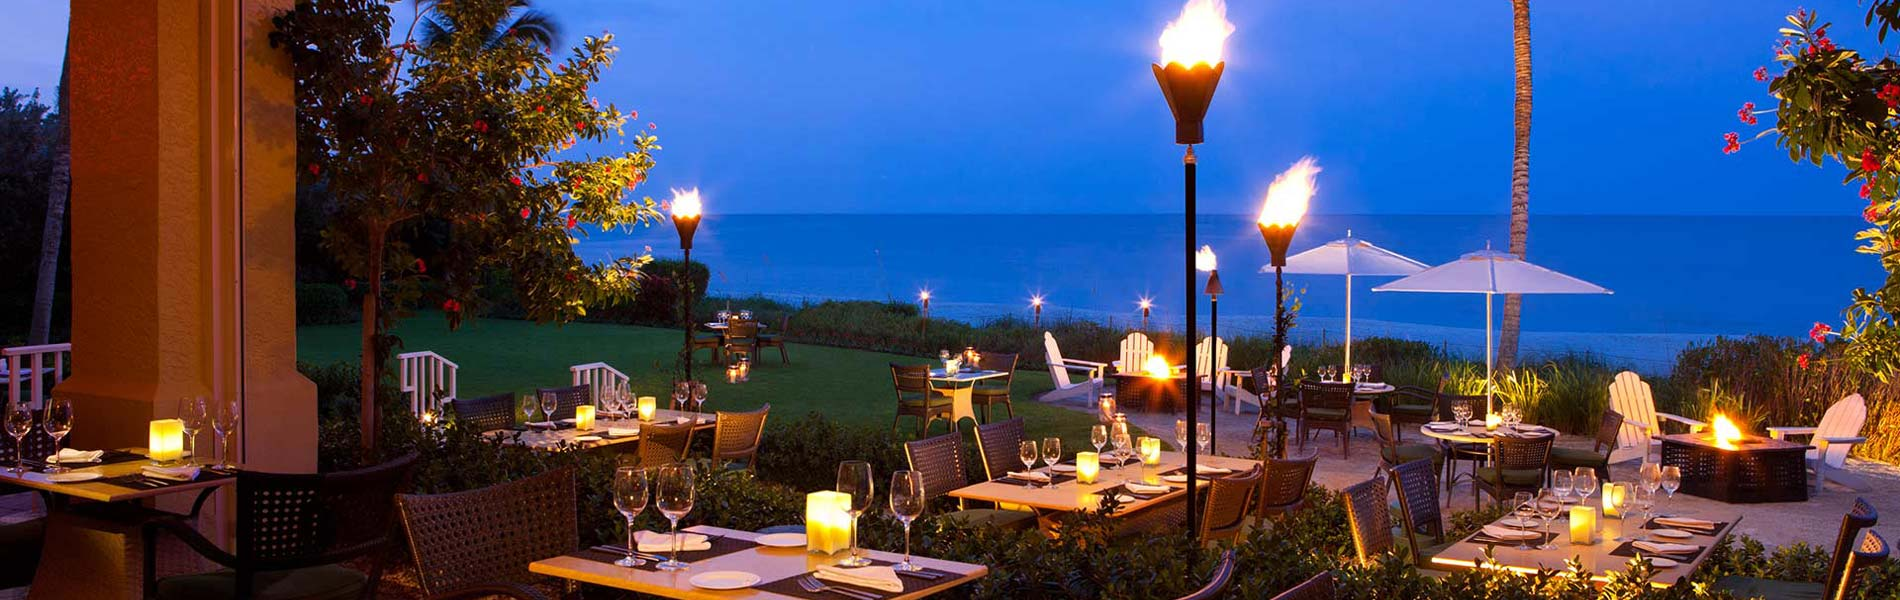 Baleen Restaurant Naples Marco Island Amp Everglades